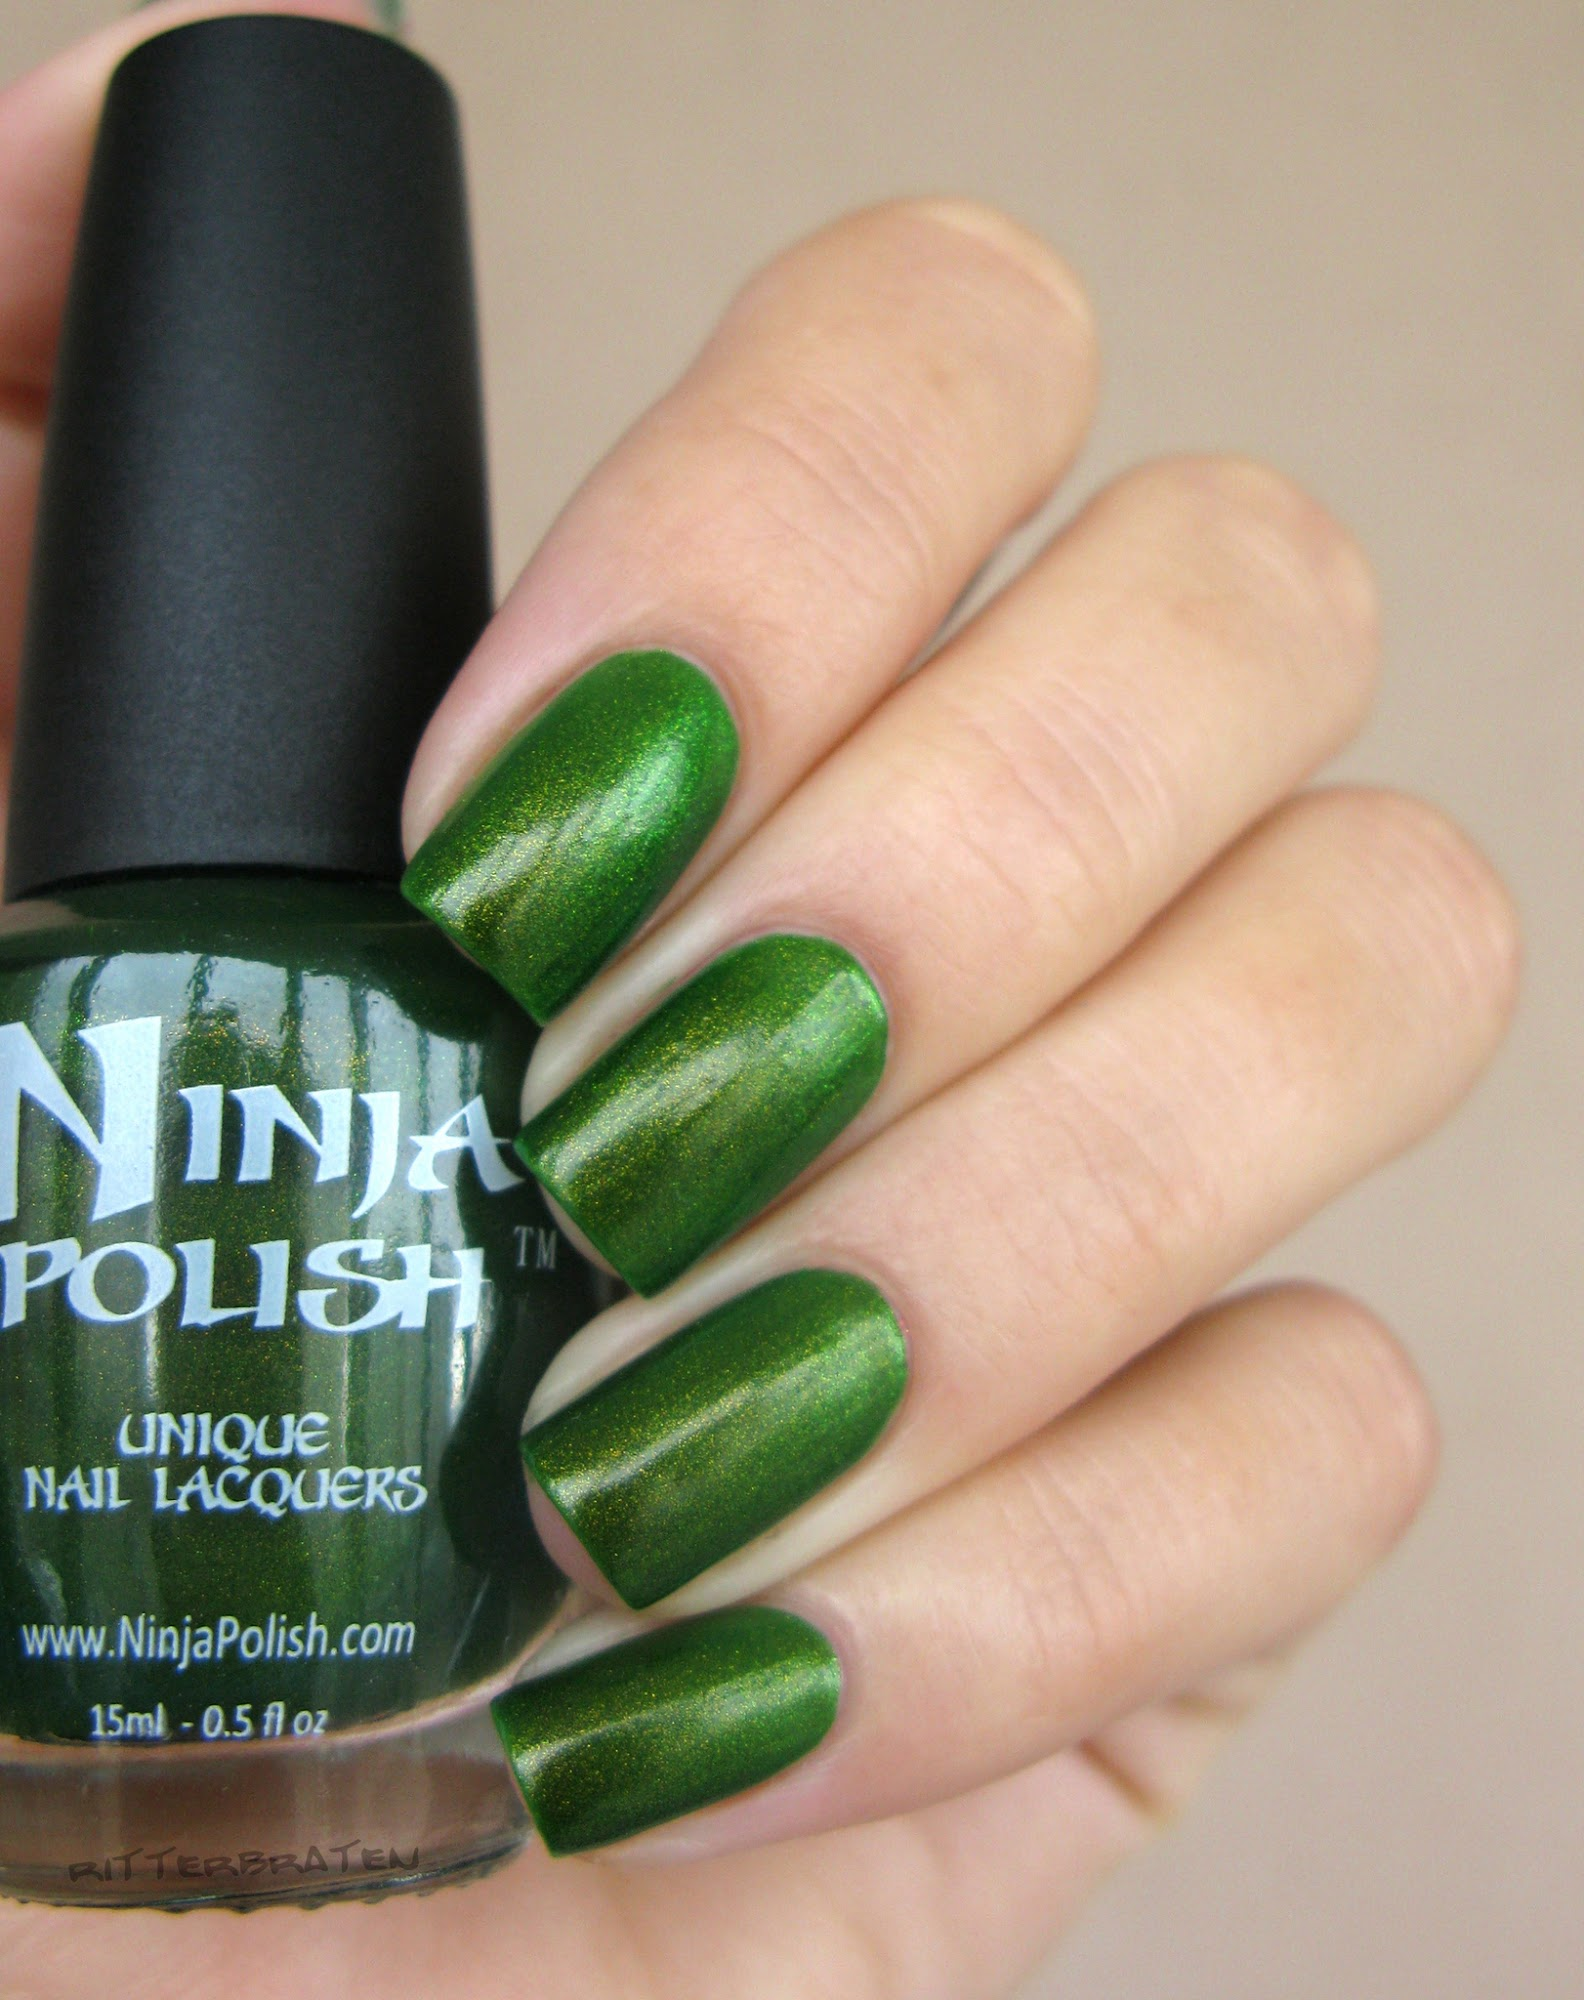 Ninja polish Shillelagh